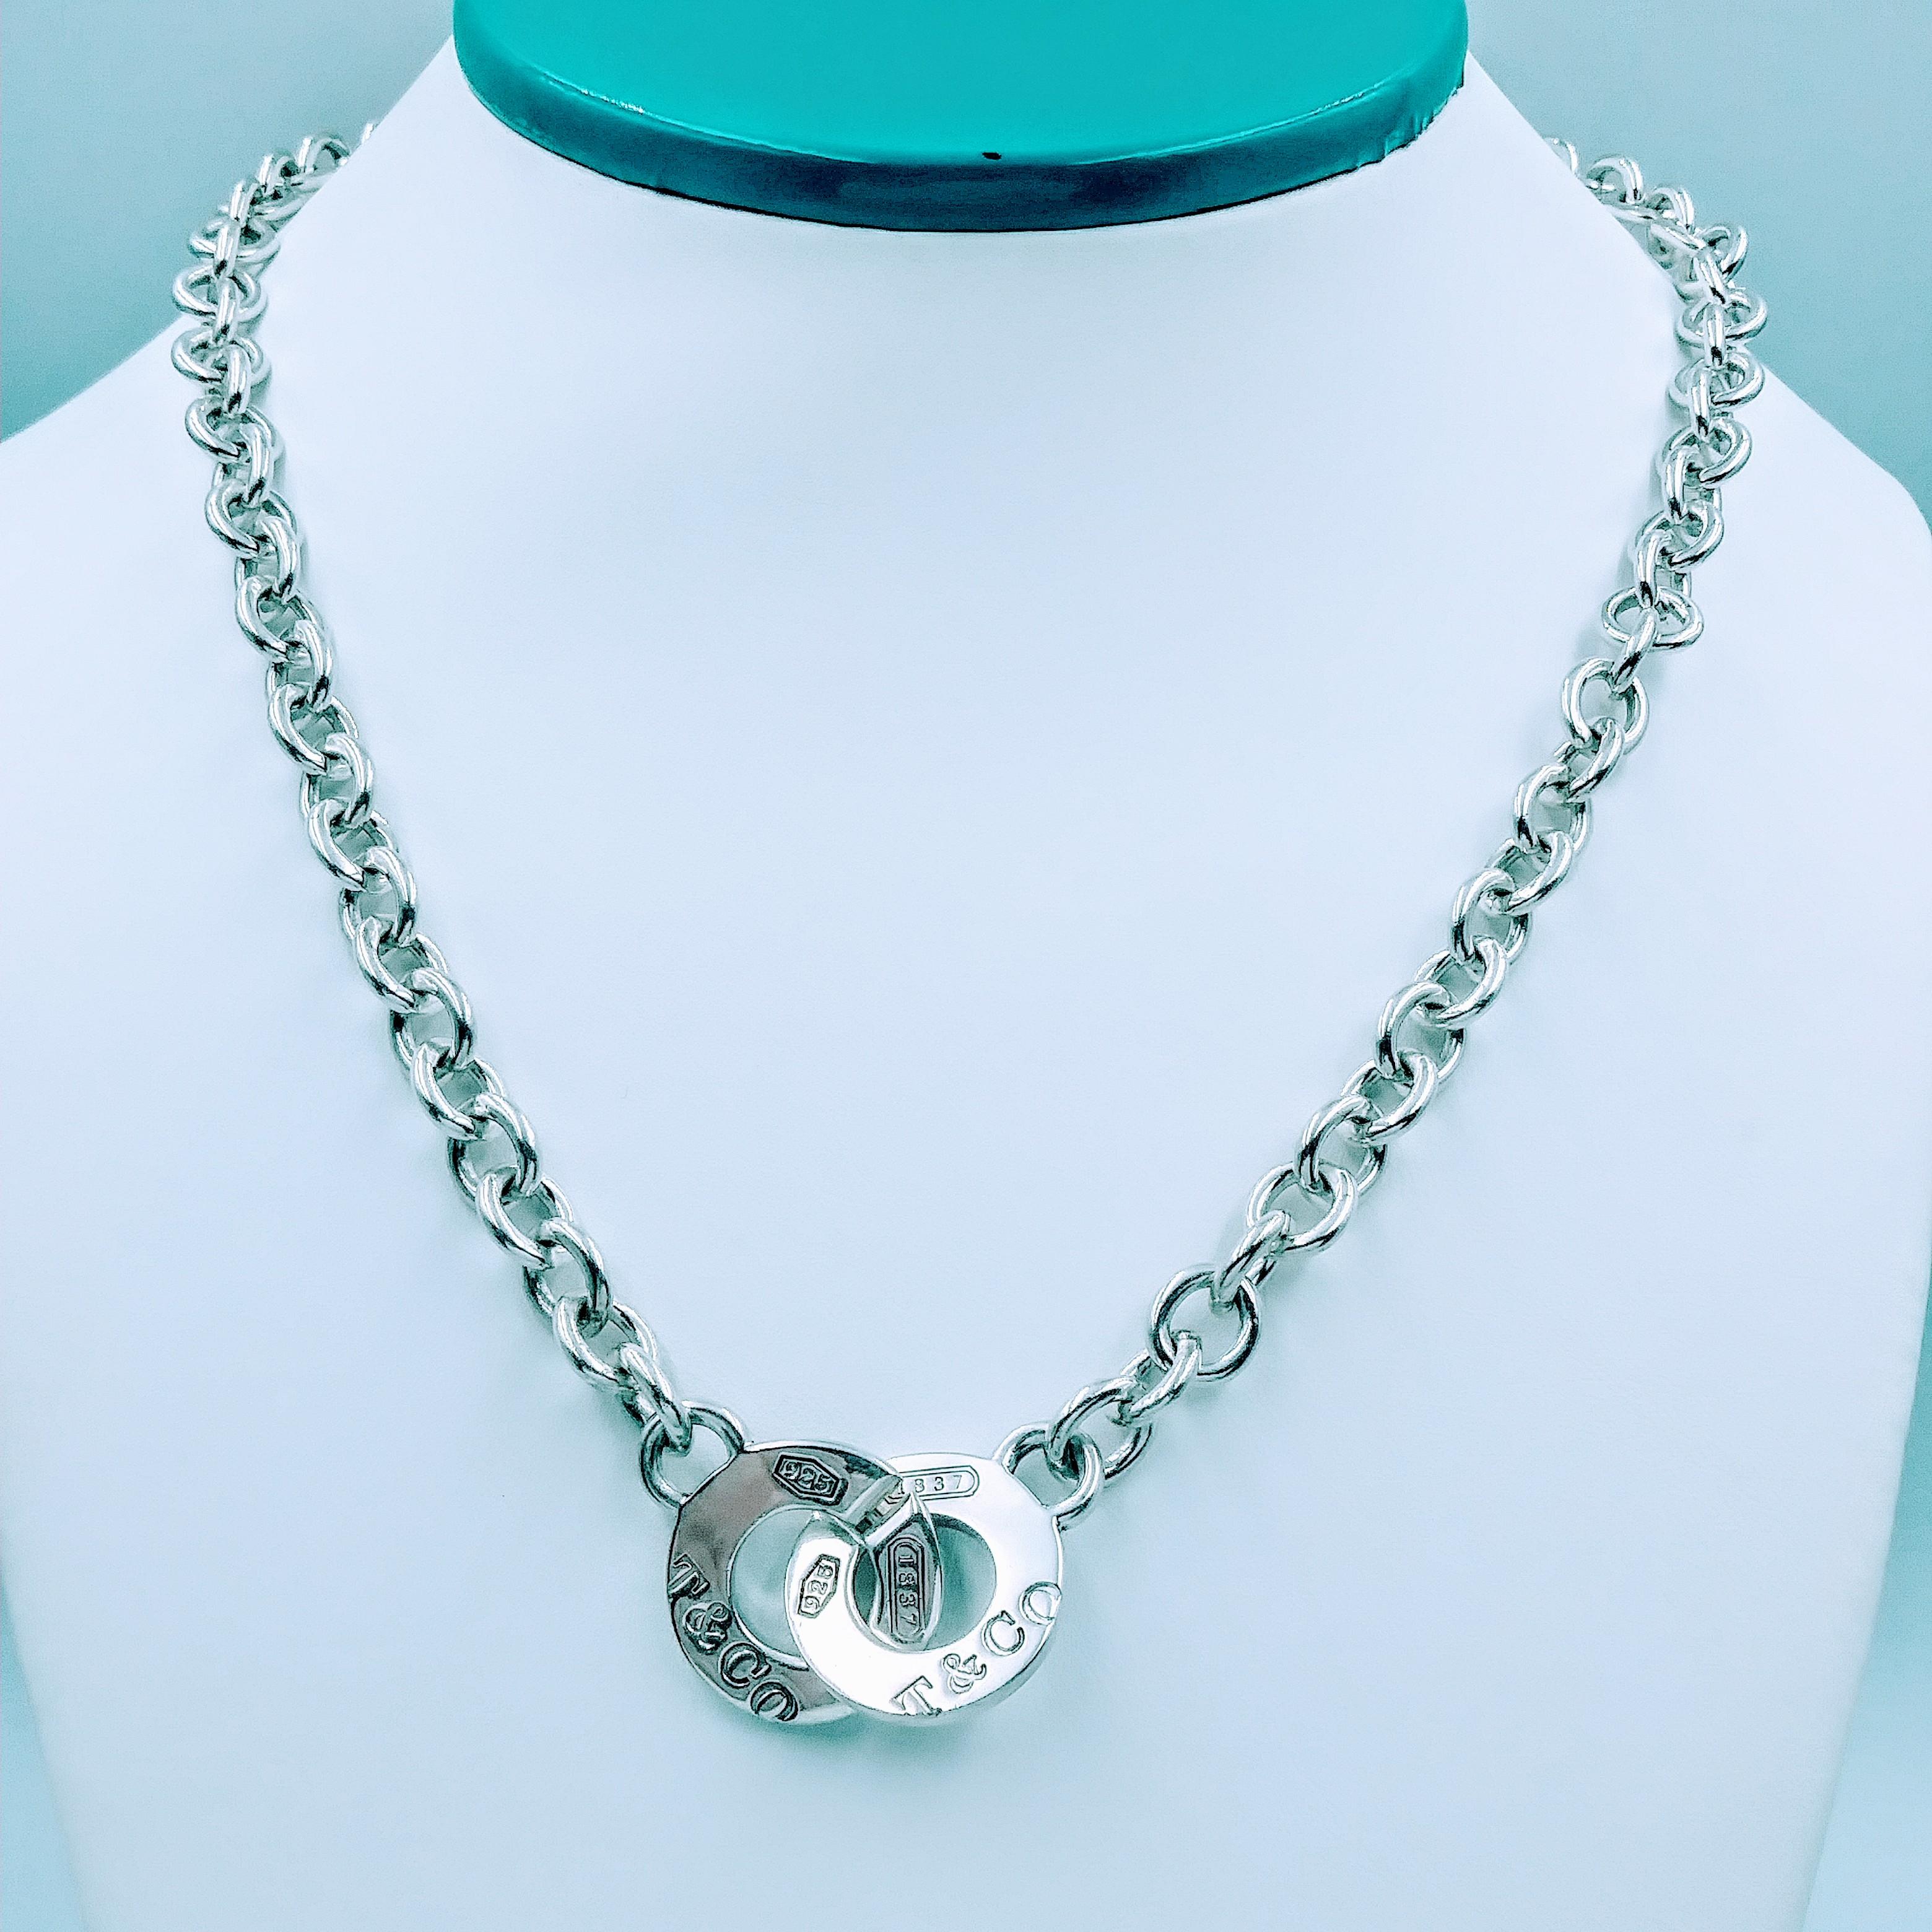 <b>Tiffany & Co.</b> Tiffany & Co 1837 Interlocking Circles Sterling Silver Necklace 17